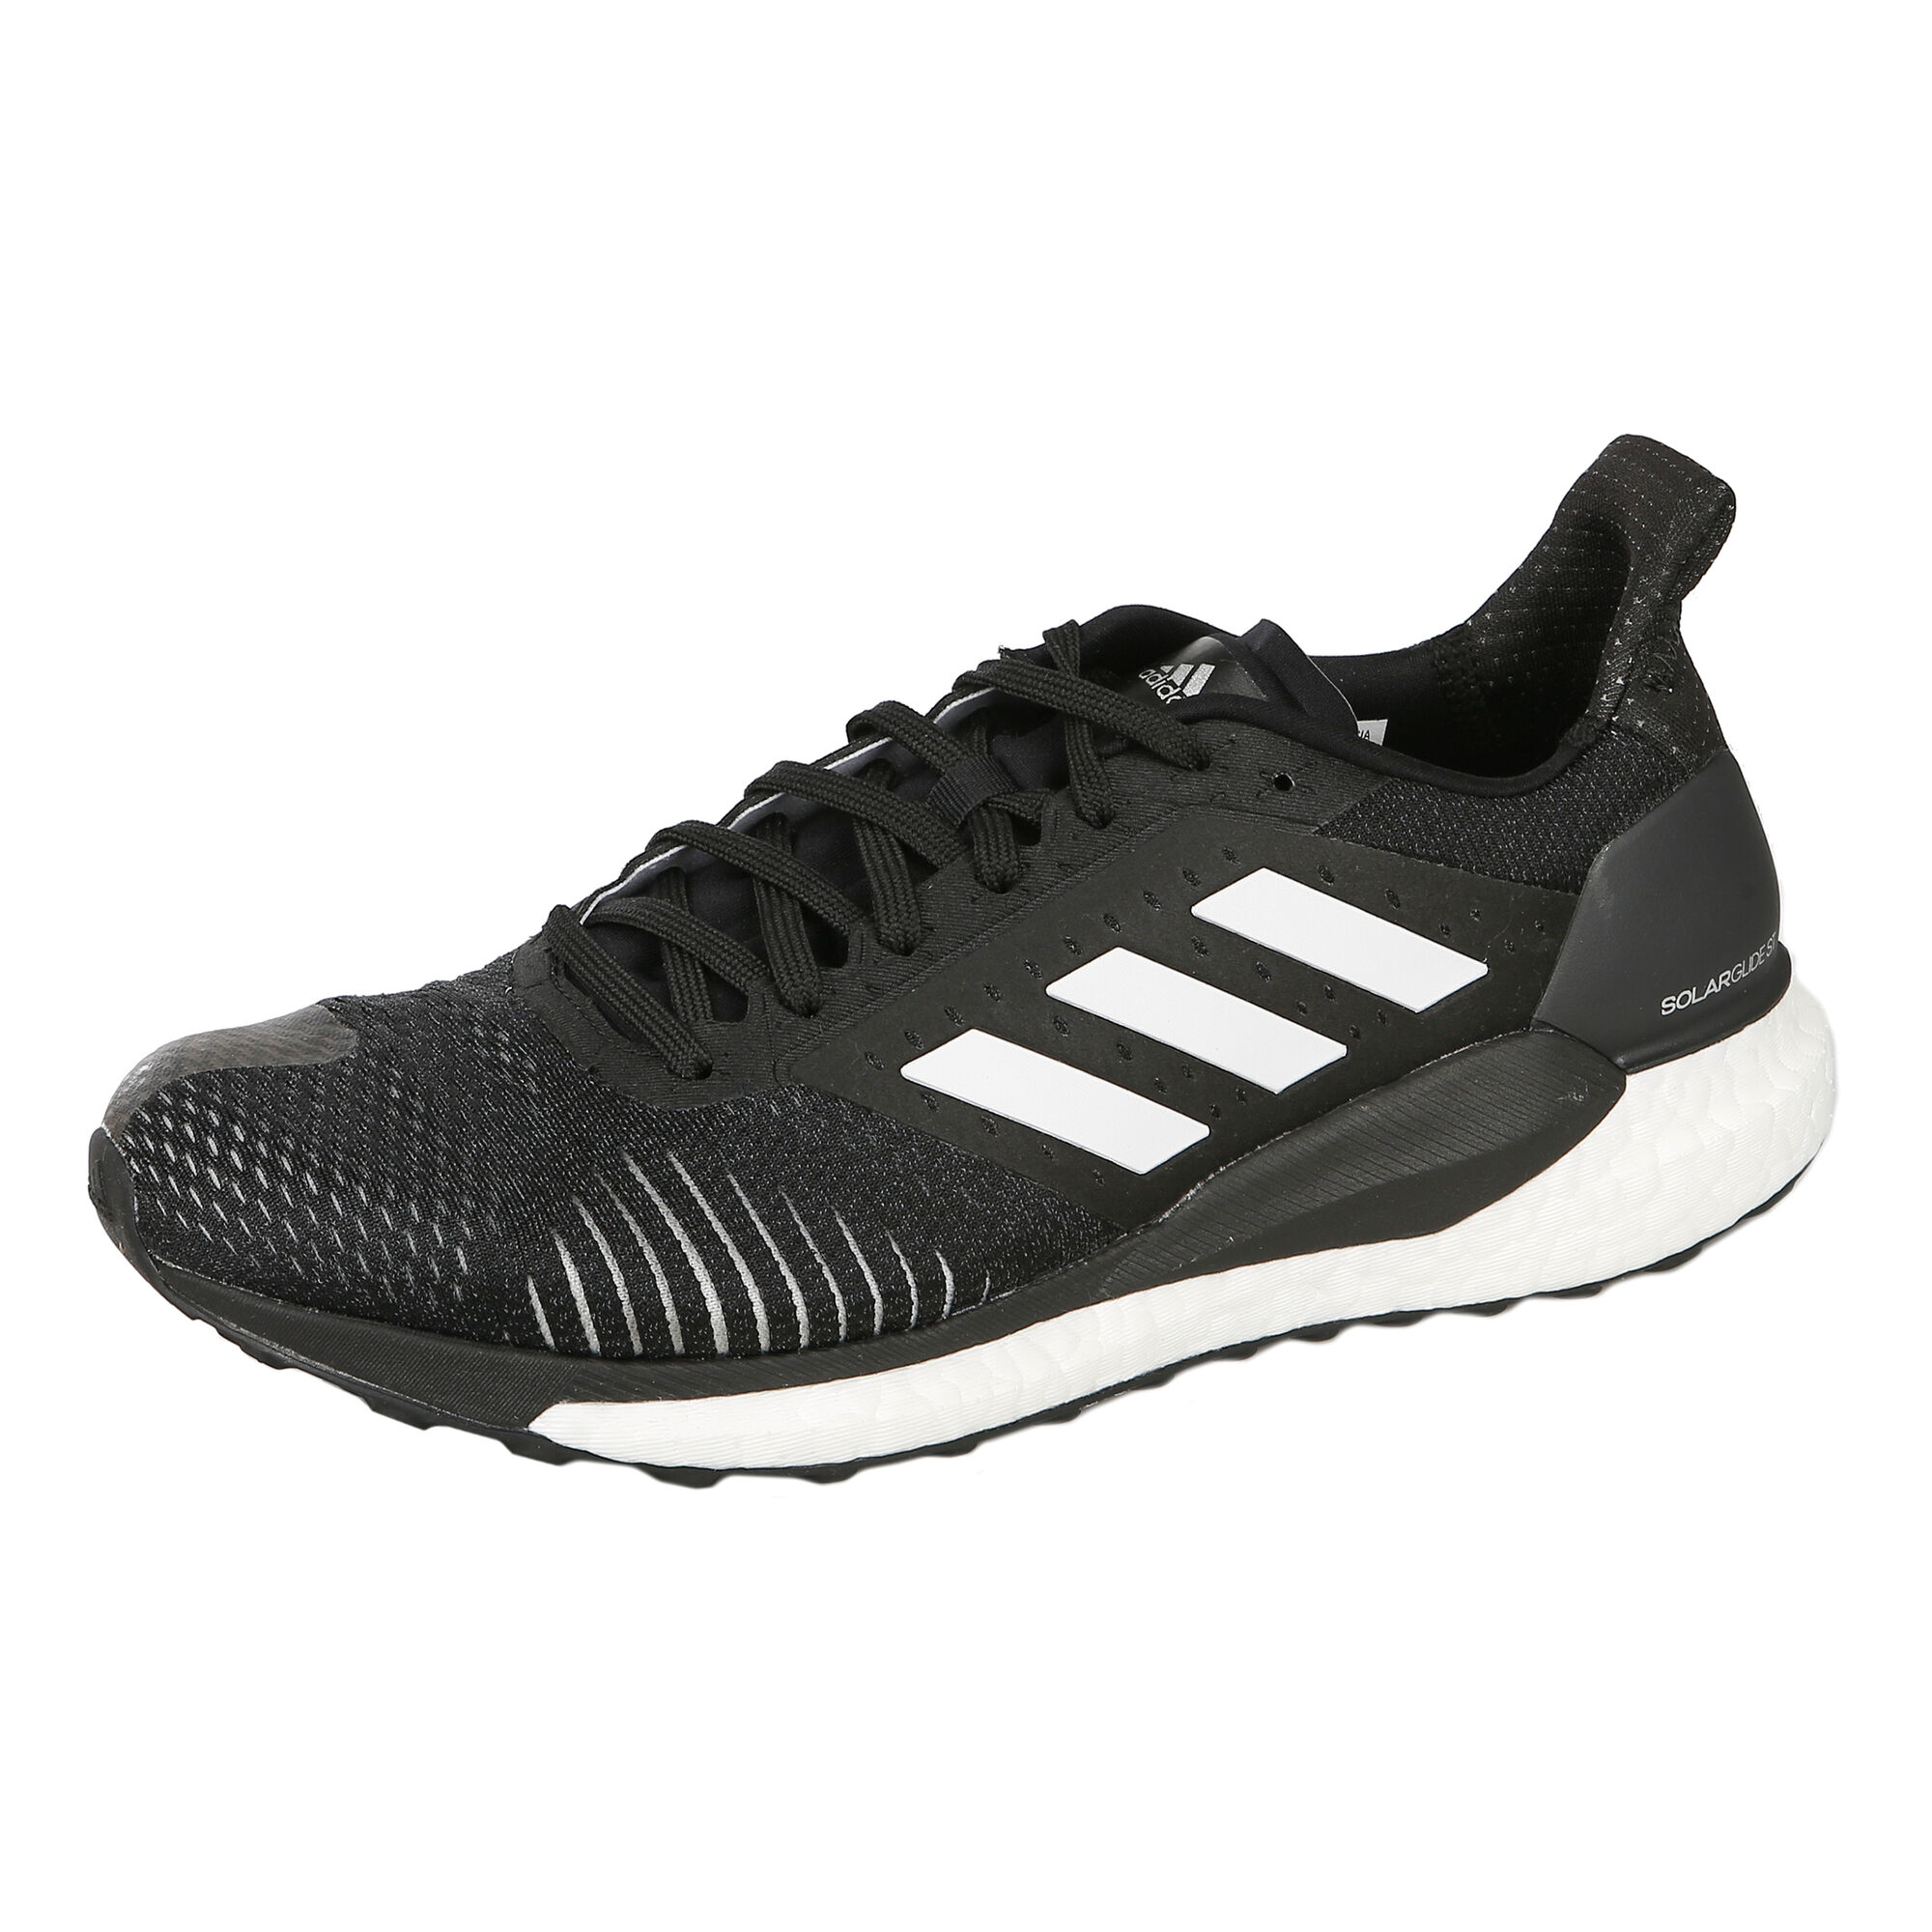 online store 7f37f d863a adidas Solar Glide ST Stability Running Shoe Men - Black, Blue